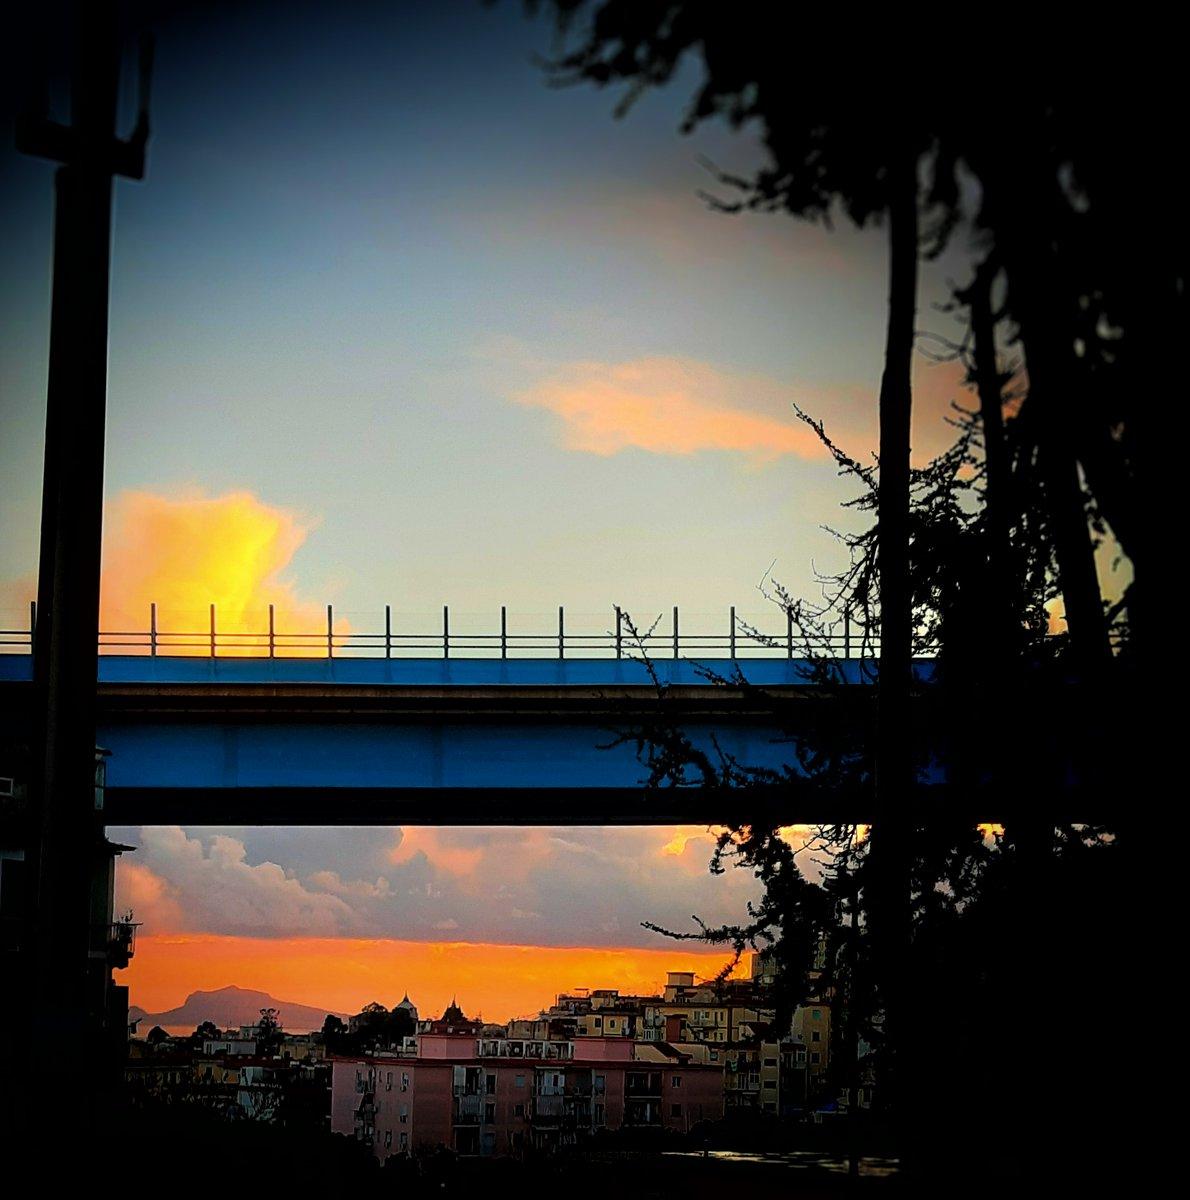 Foto dal mio quartiere - Tramonto e asfalto blu - #carlodemarco #napoli #naples #italia #campania #italy #sunset #tramonto #sky #trees #landscape #panorama #orange #clouds #landscapephotography #luigiventrigliaphotography #sera #night #vignettatura #blu #blue #colors #building